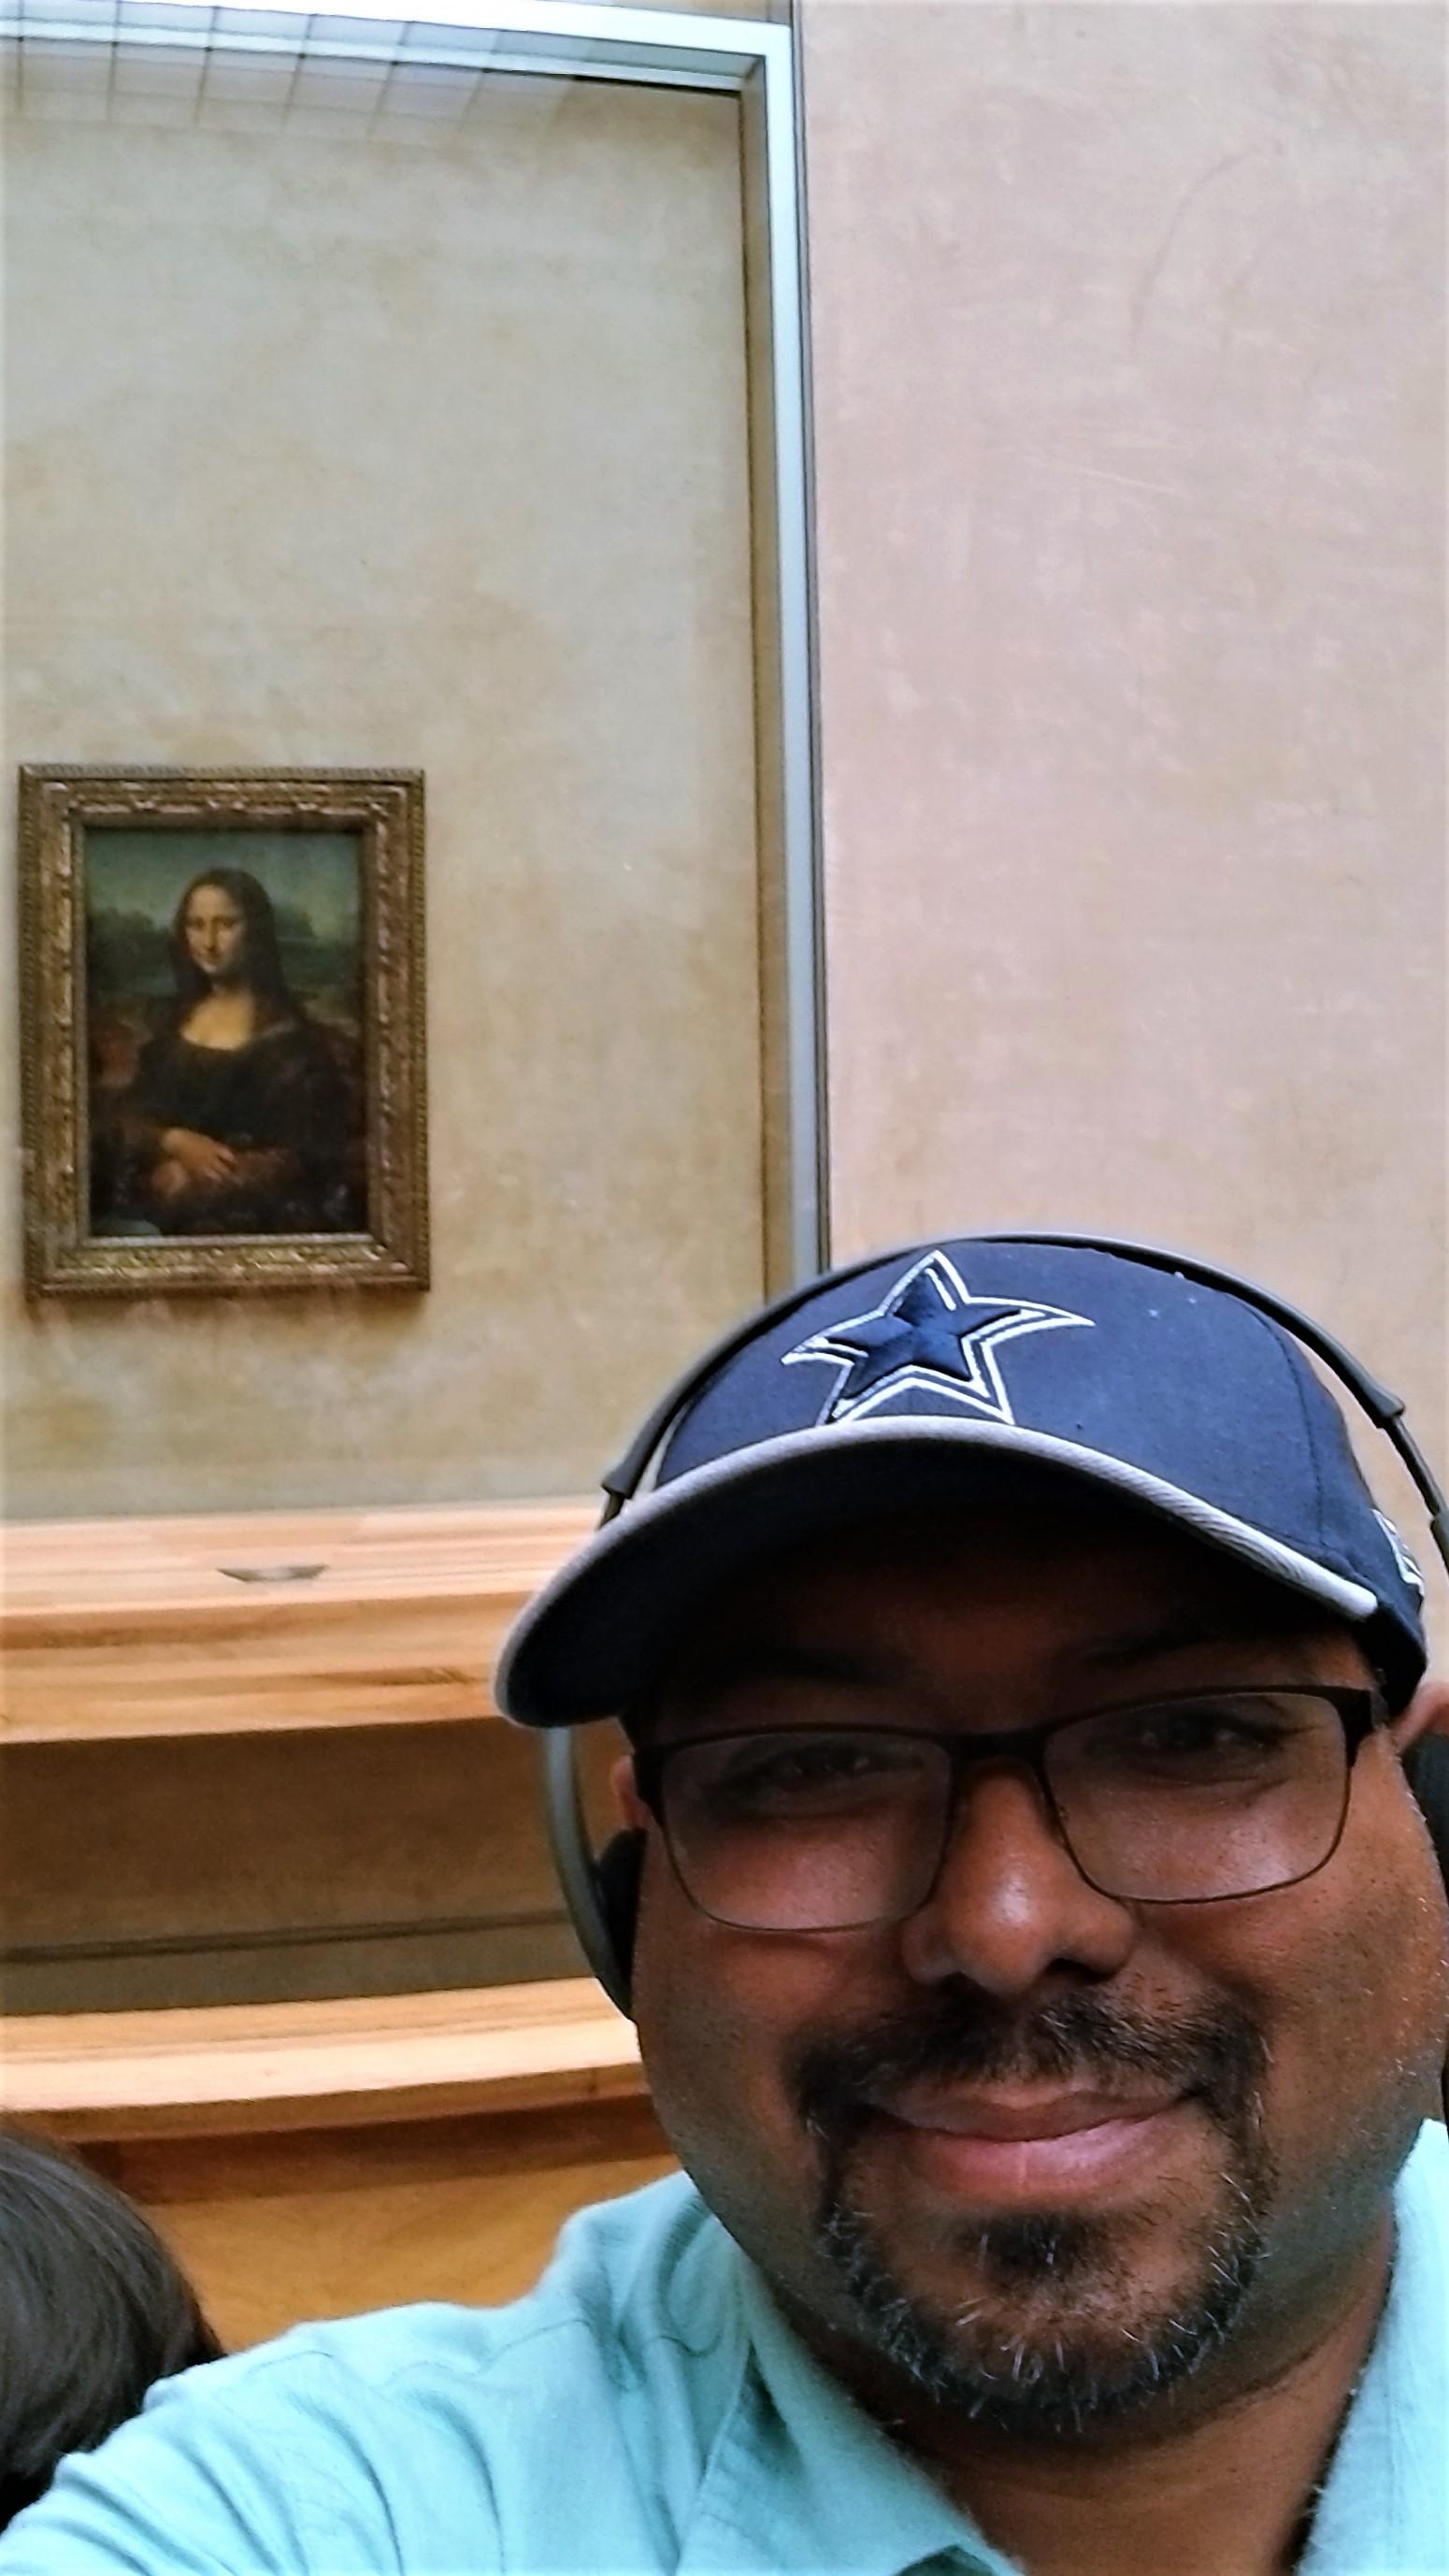 Steven with Mona Lisa